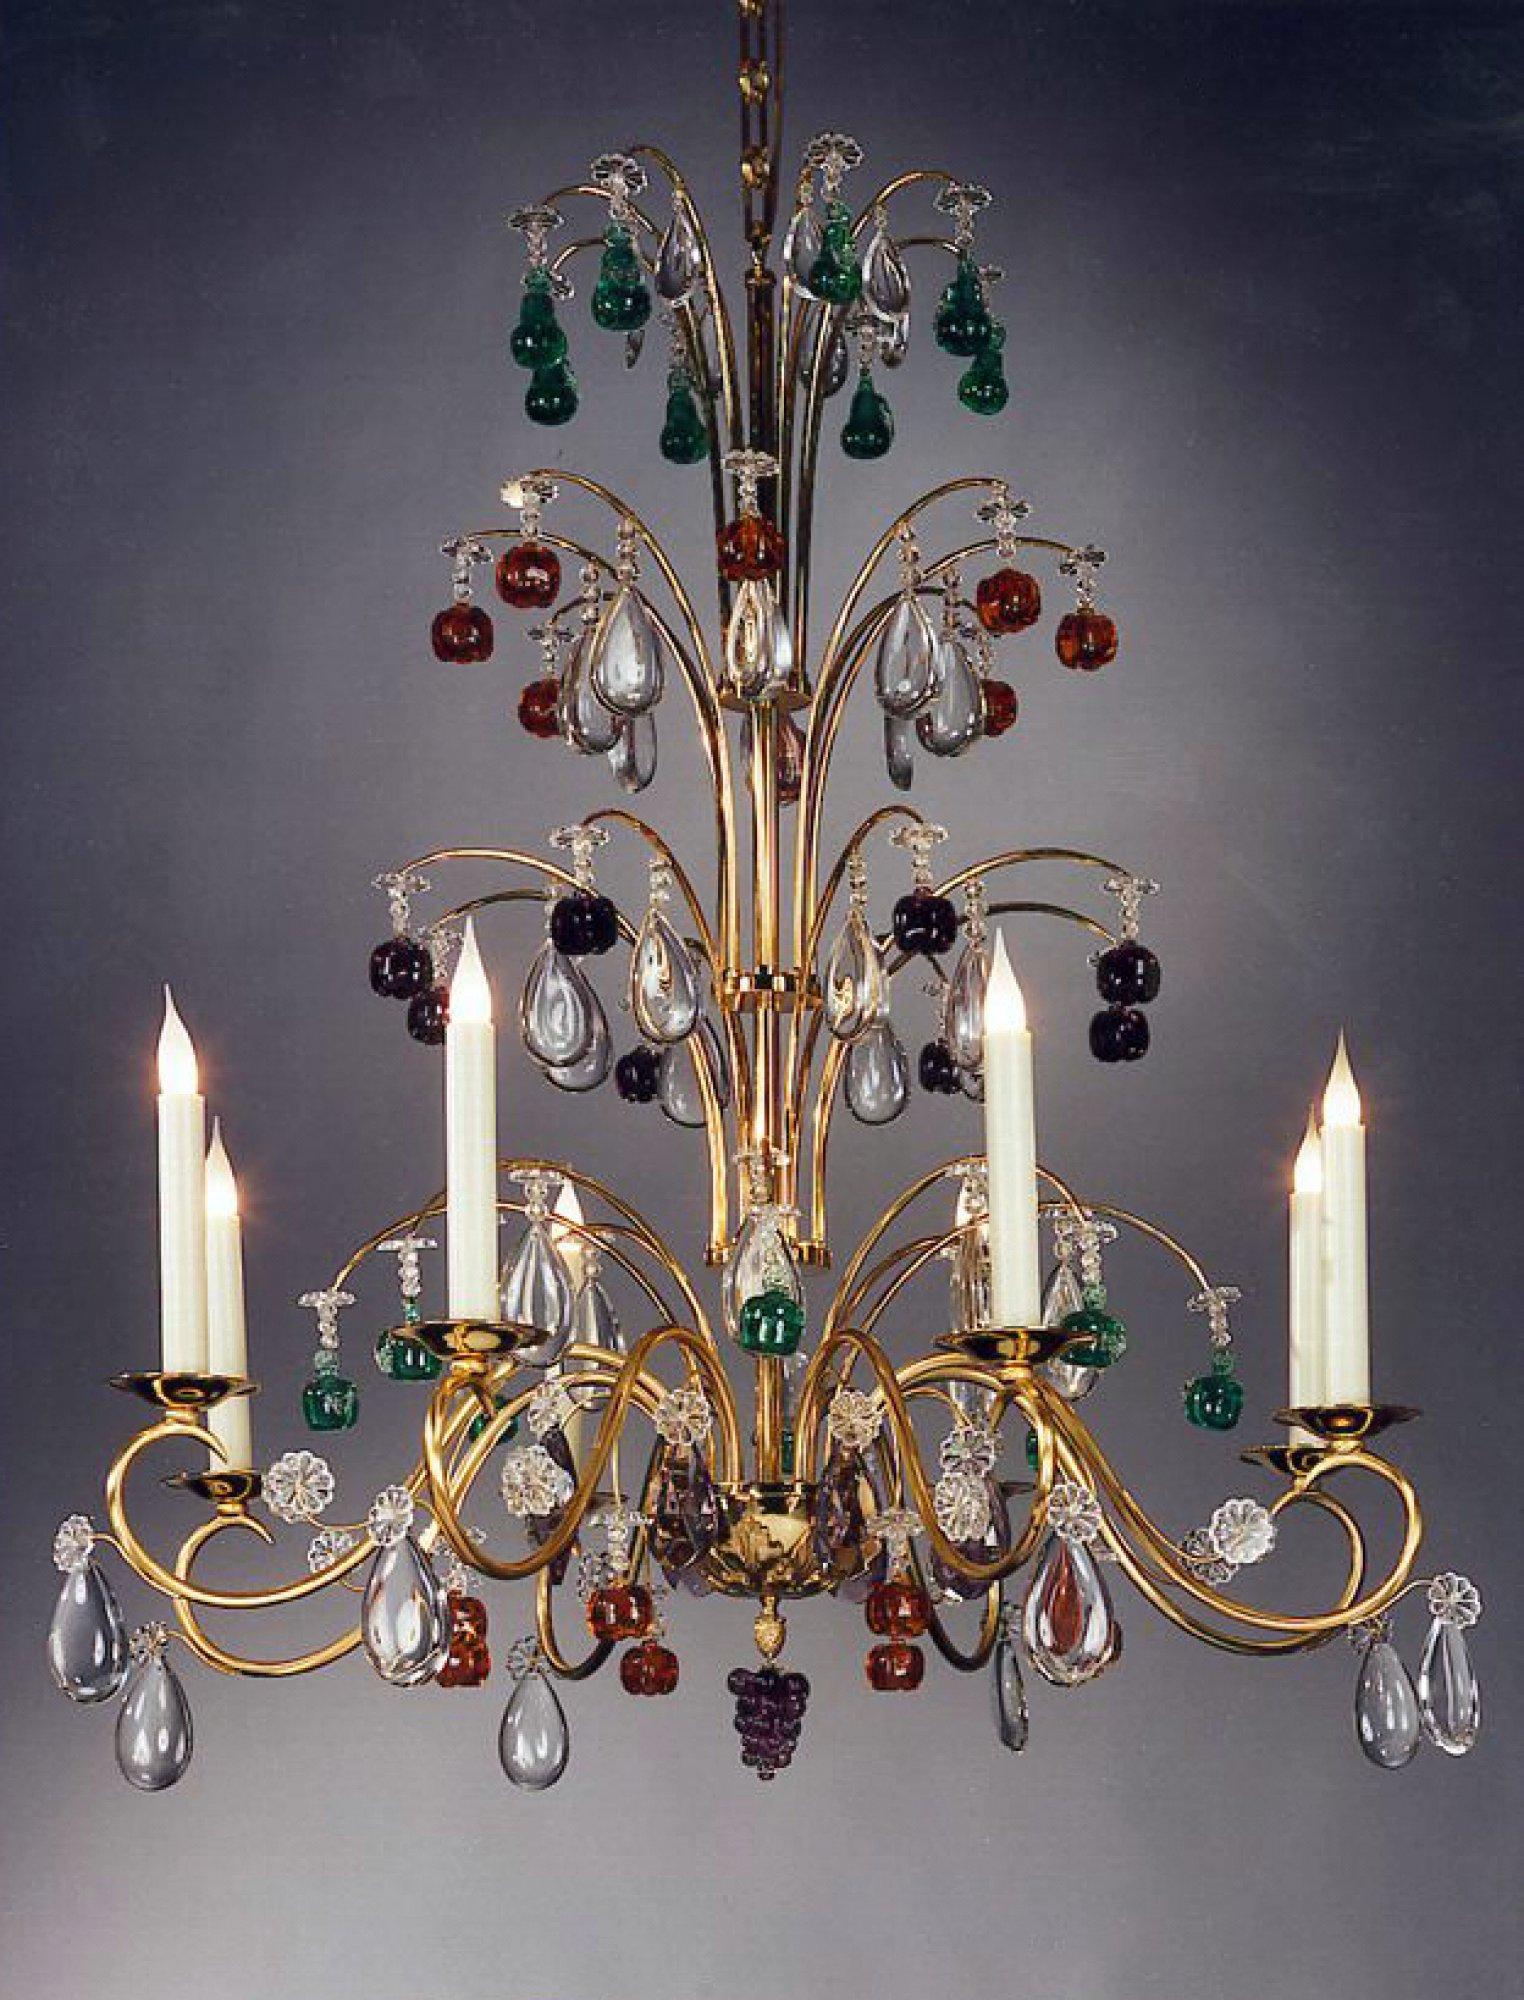 Cristaux chandelier